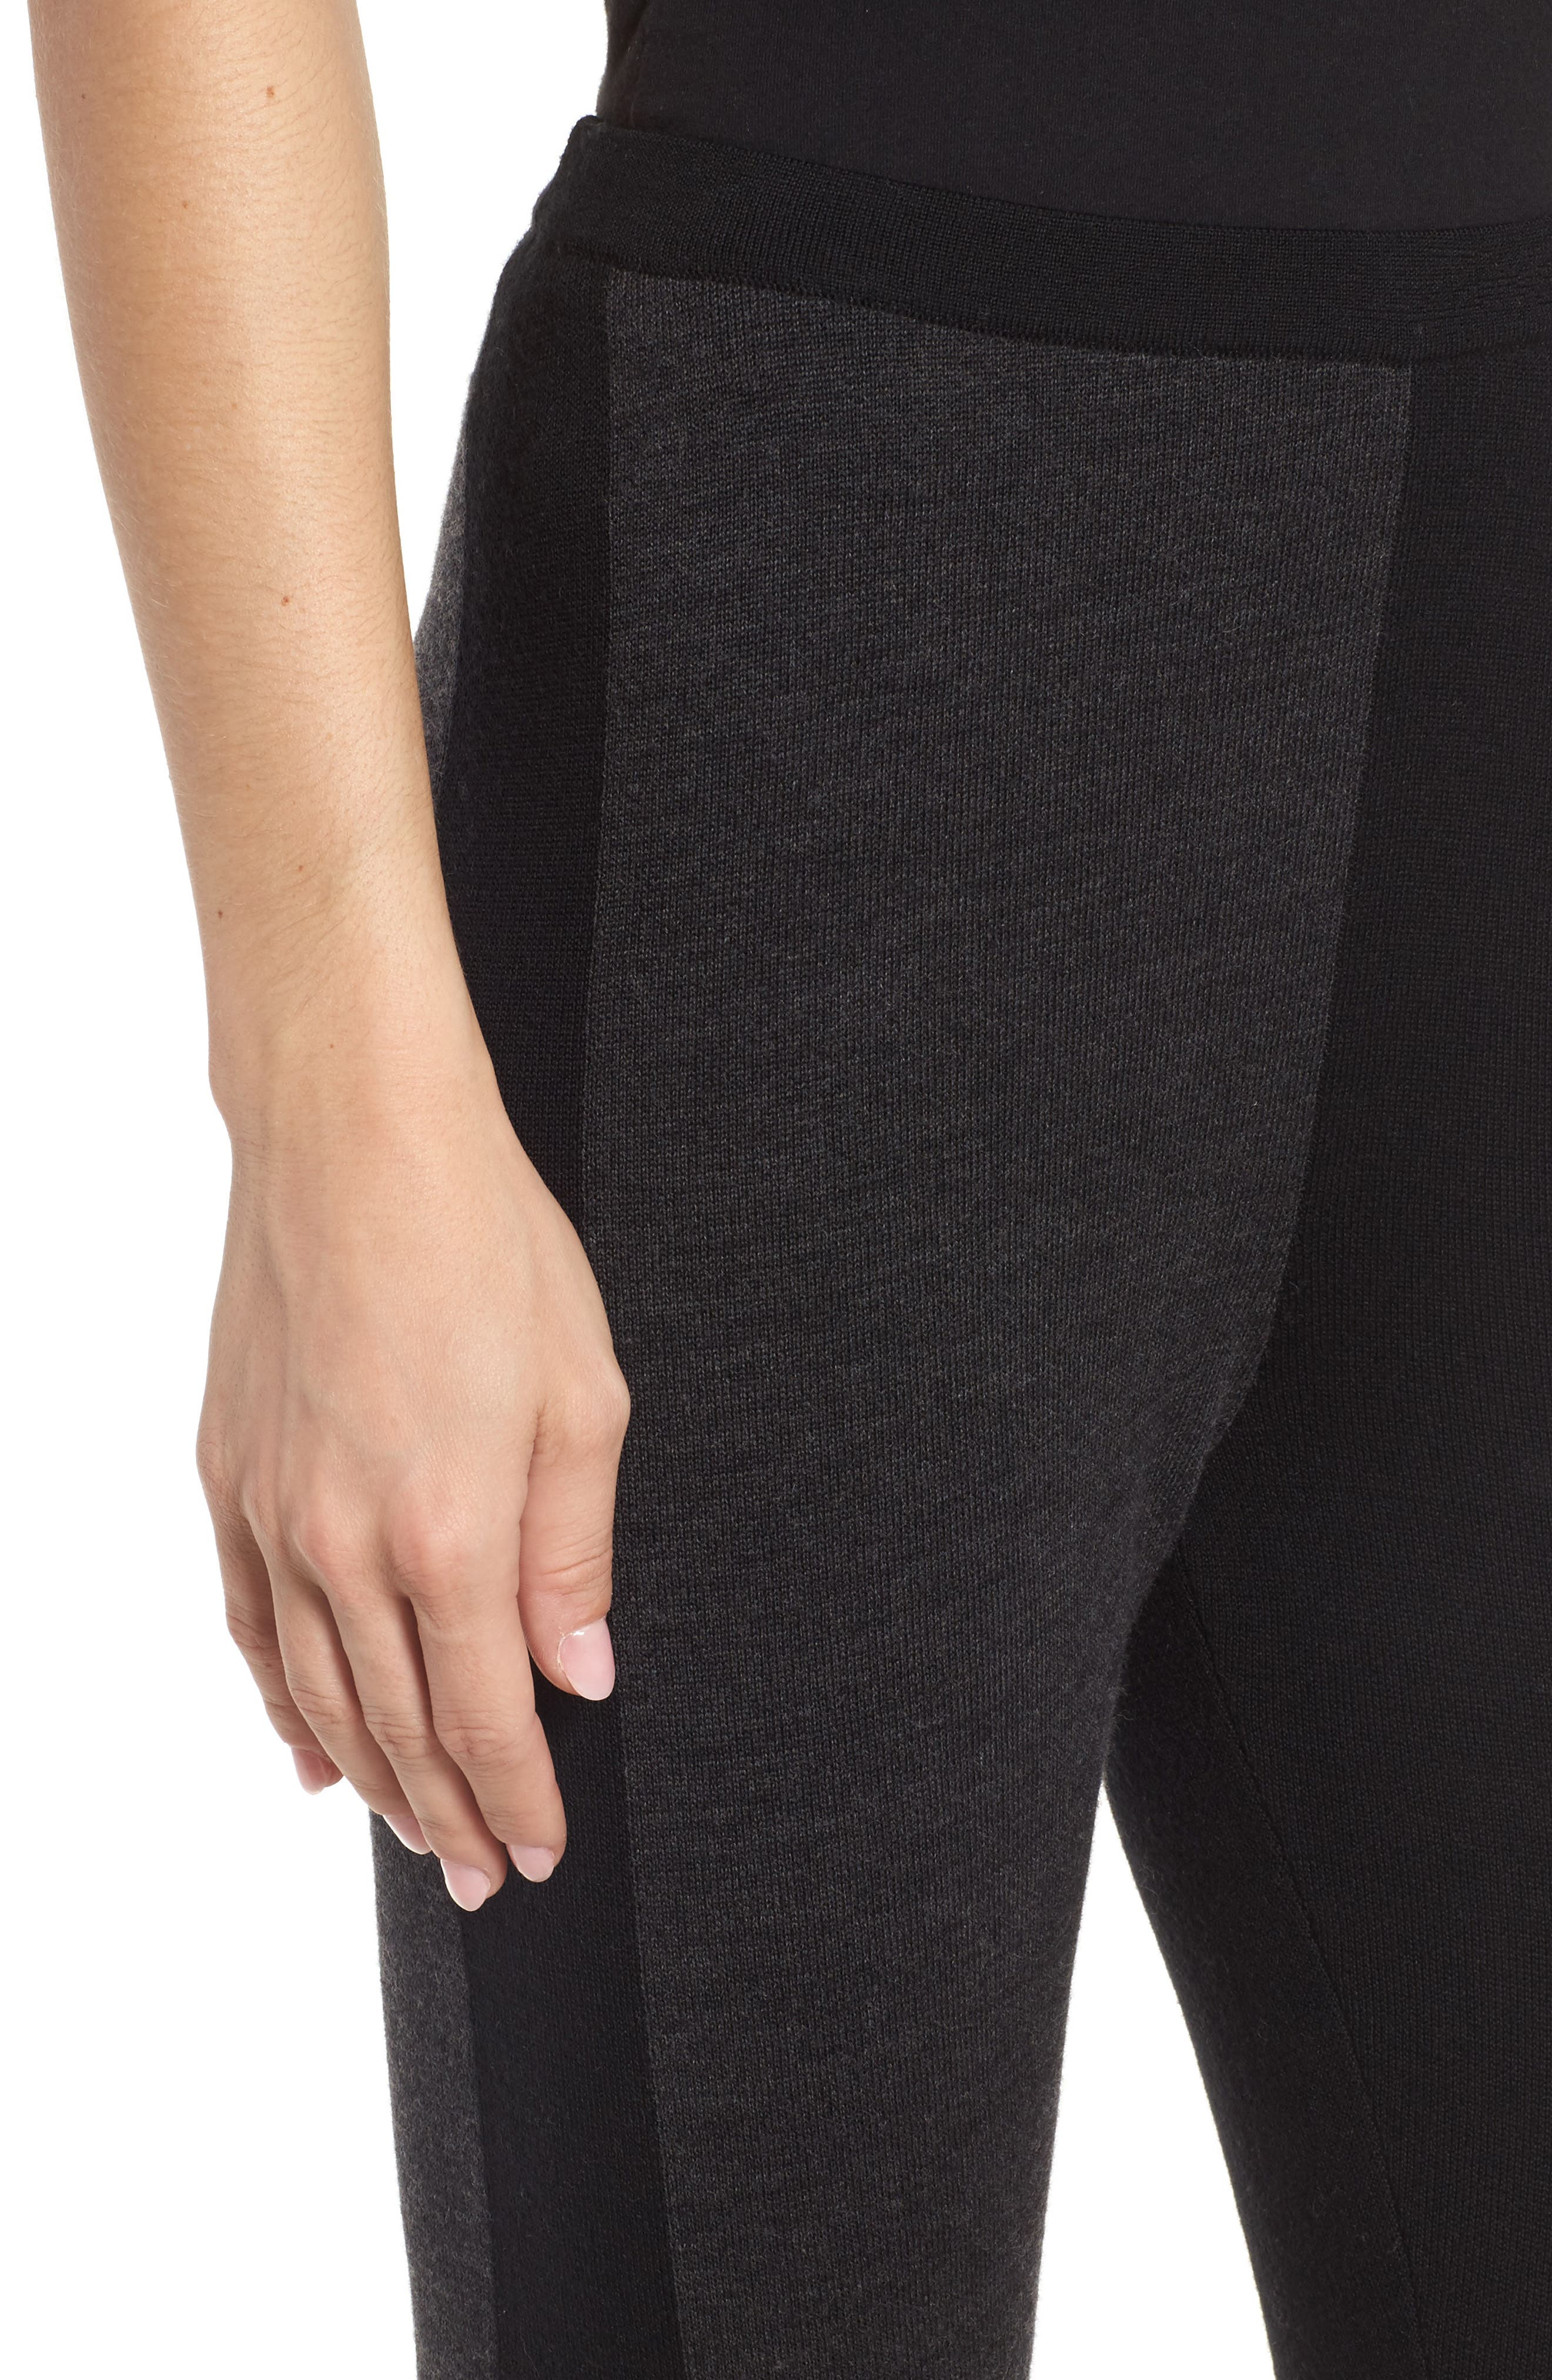 Colorblock Leggings,                             Alternate thumbnail 4, color,                             Charcoal Black